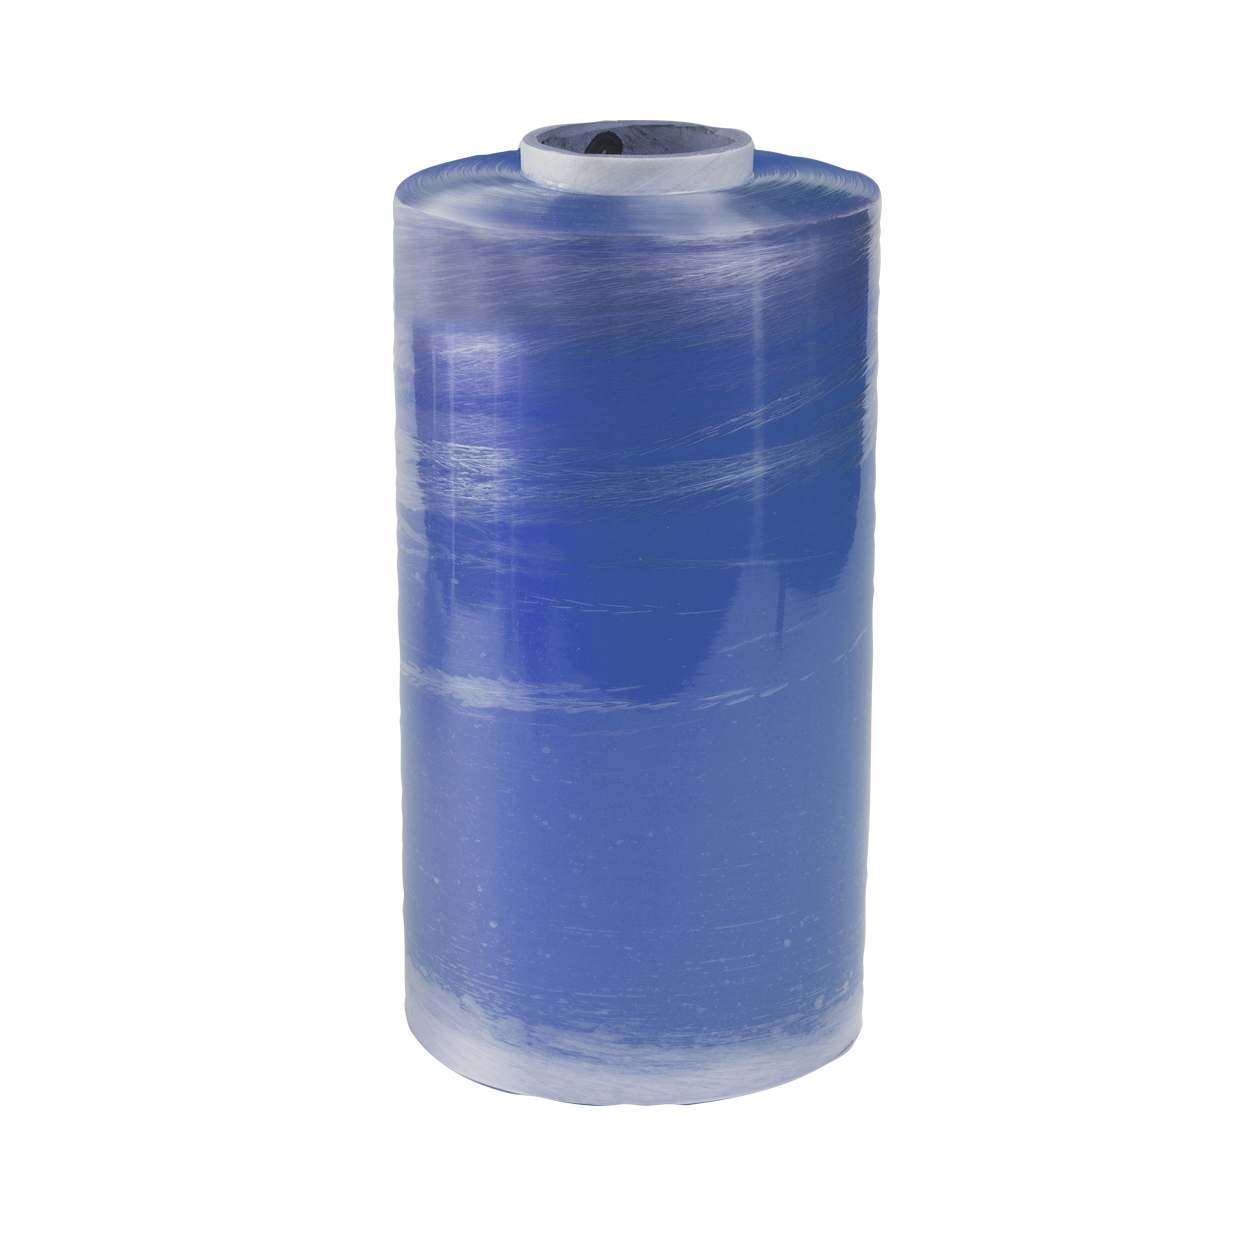 Miler® Cling Film Roll 12